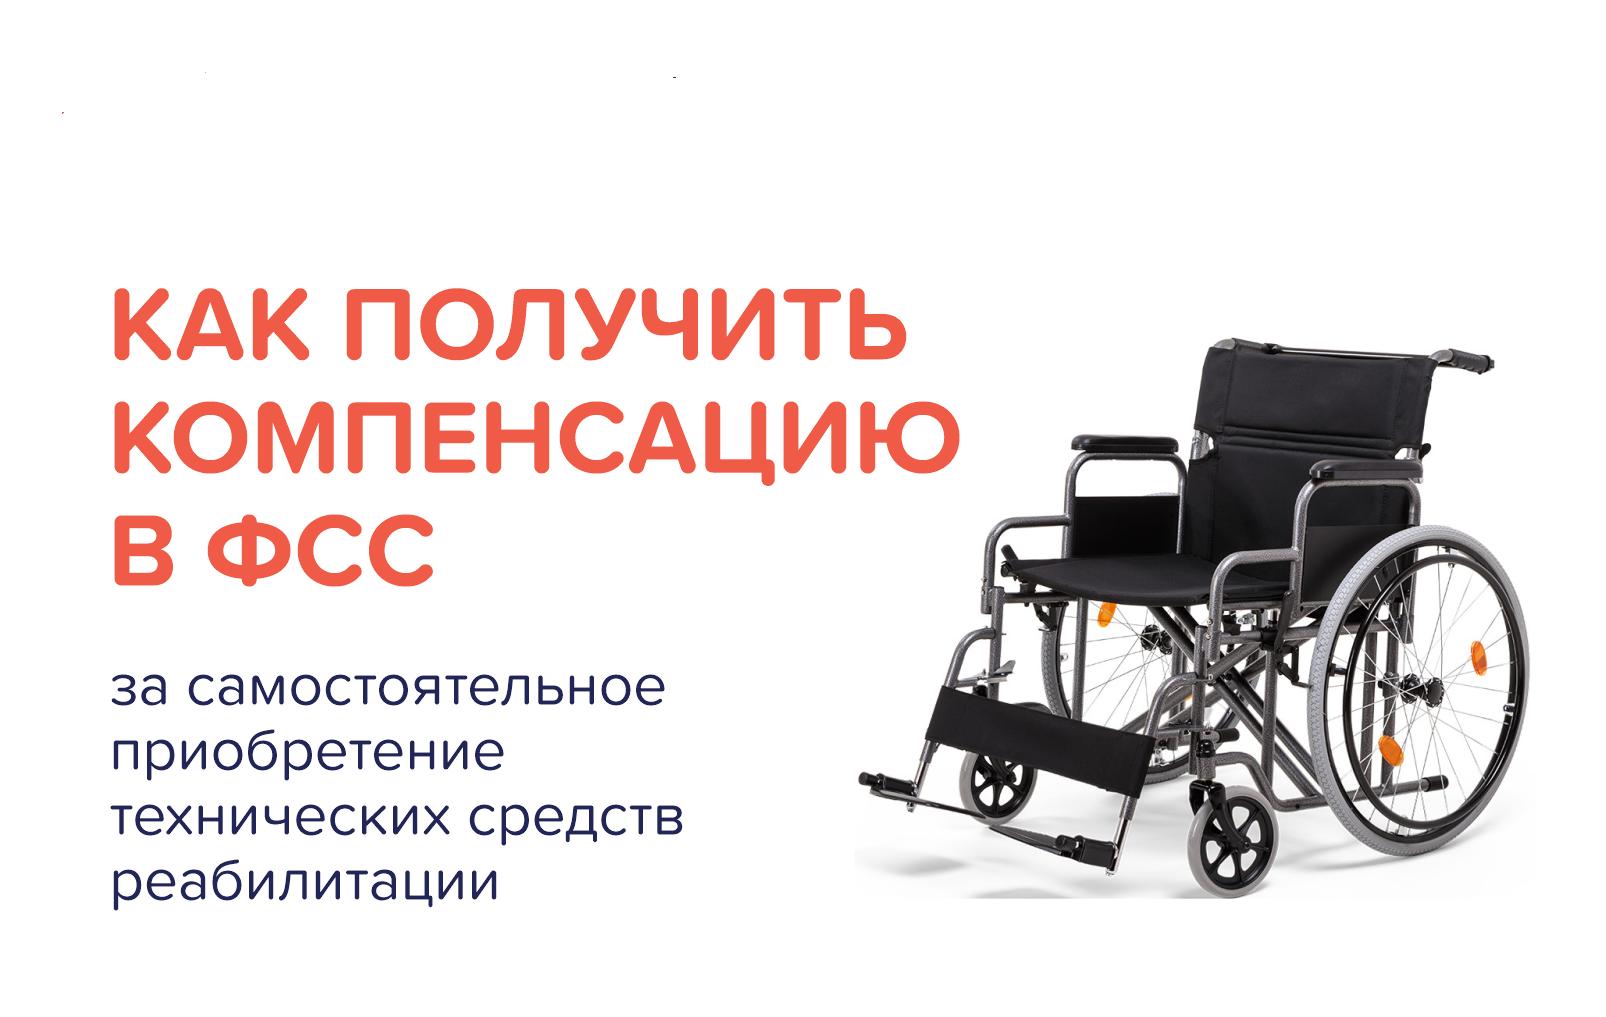 Компенсация инвалидам